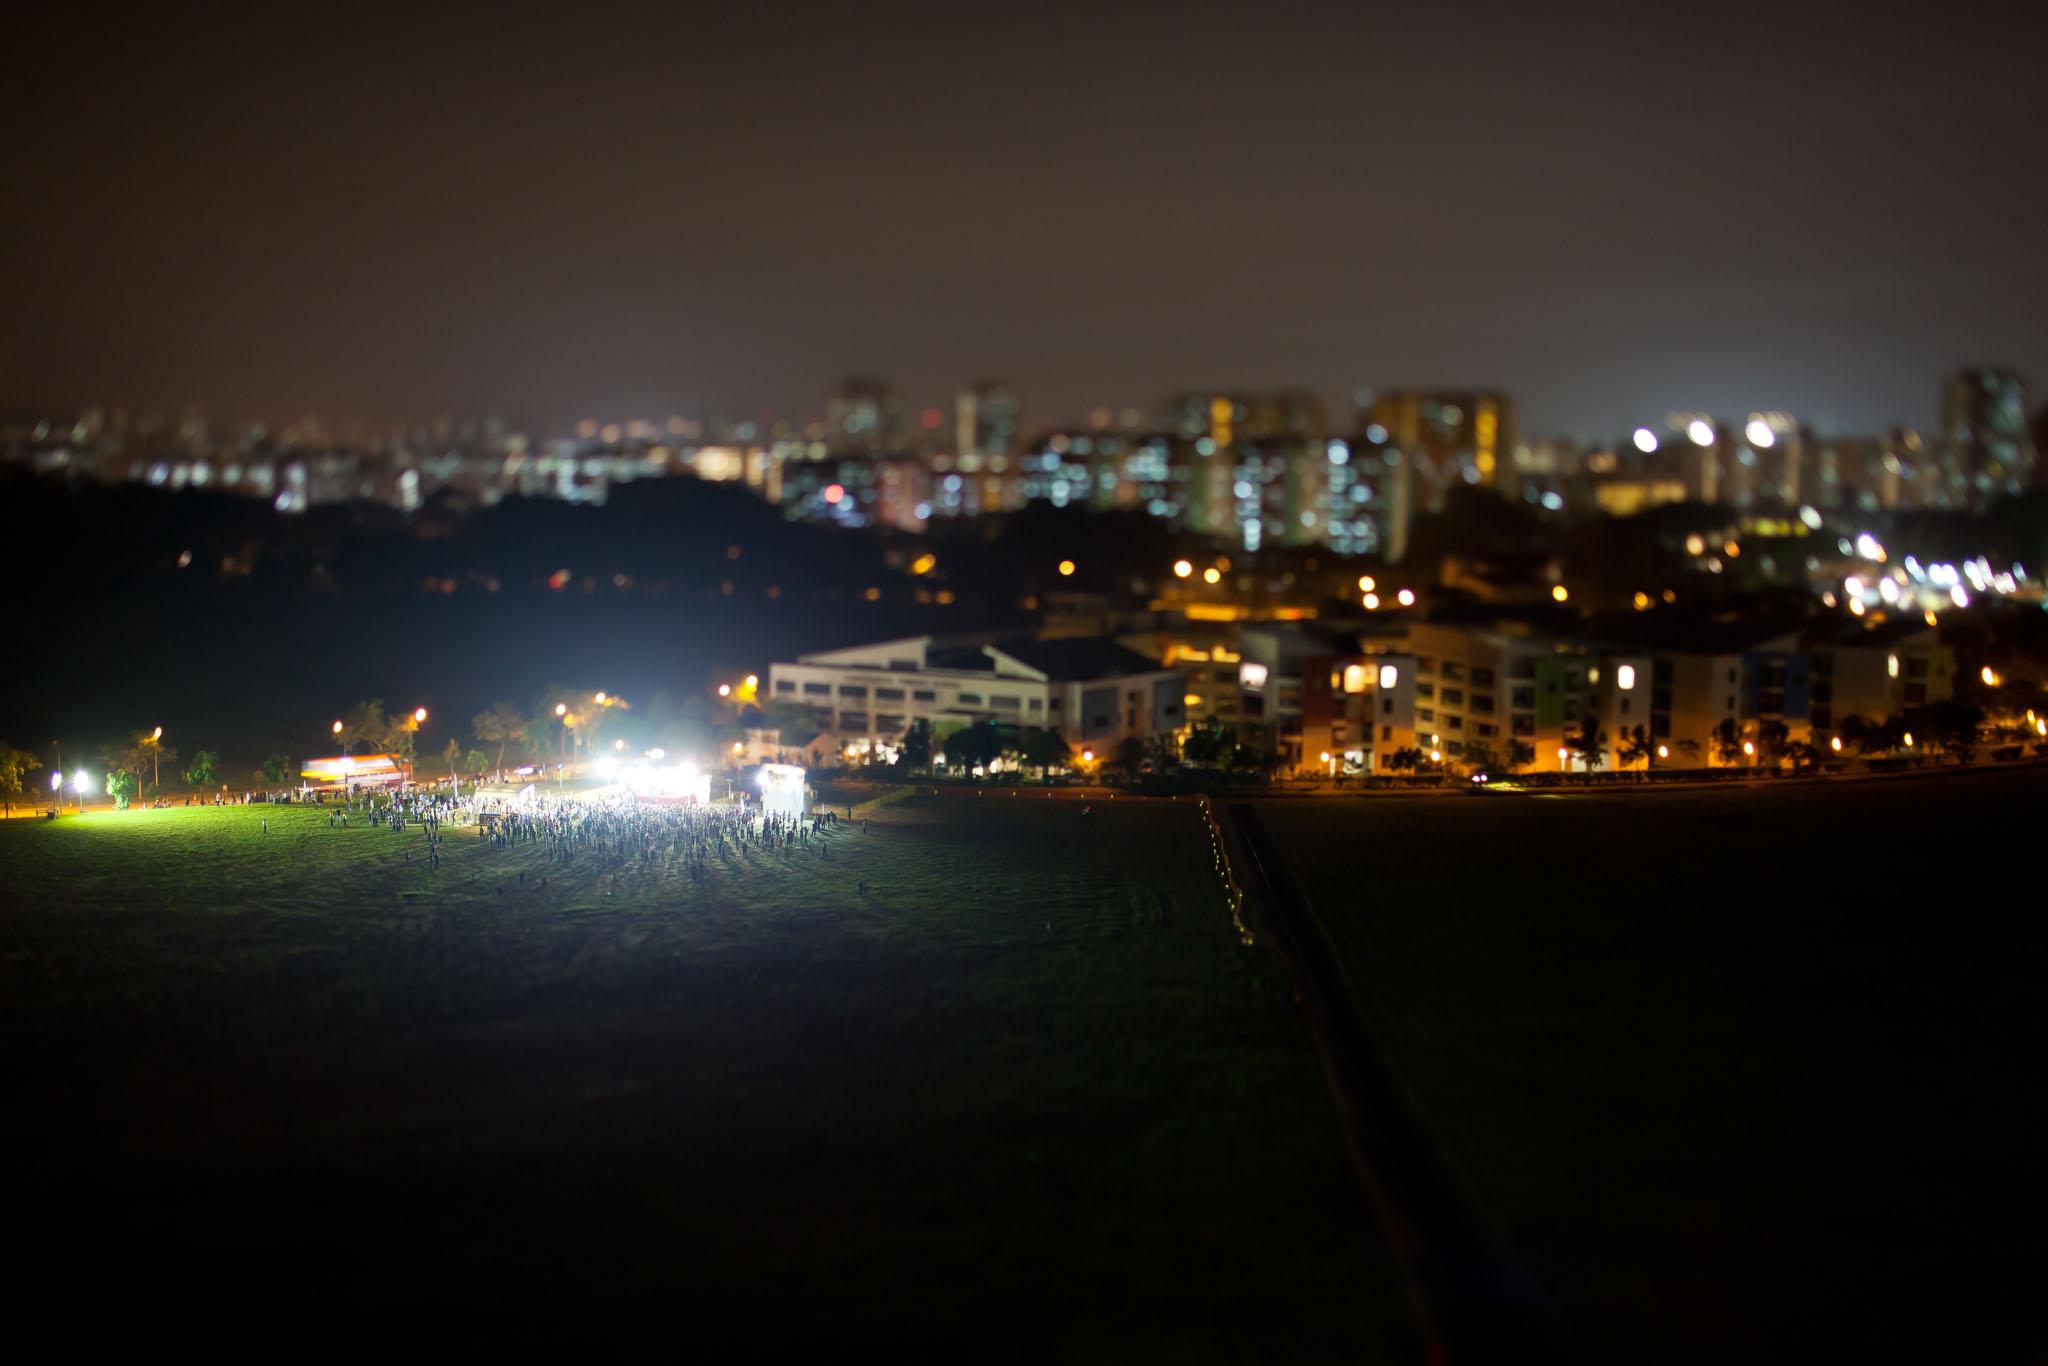 singapore-commercial-photographer-editorial-documentary-tiltshift-singaplural-zakaria-zainal-11.jpg